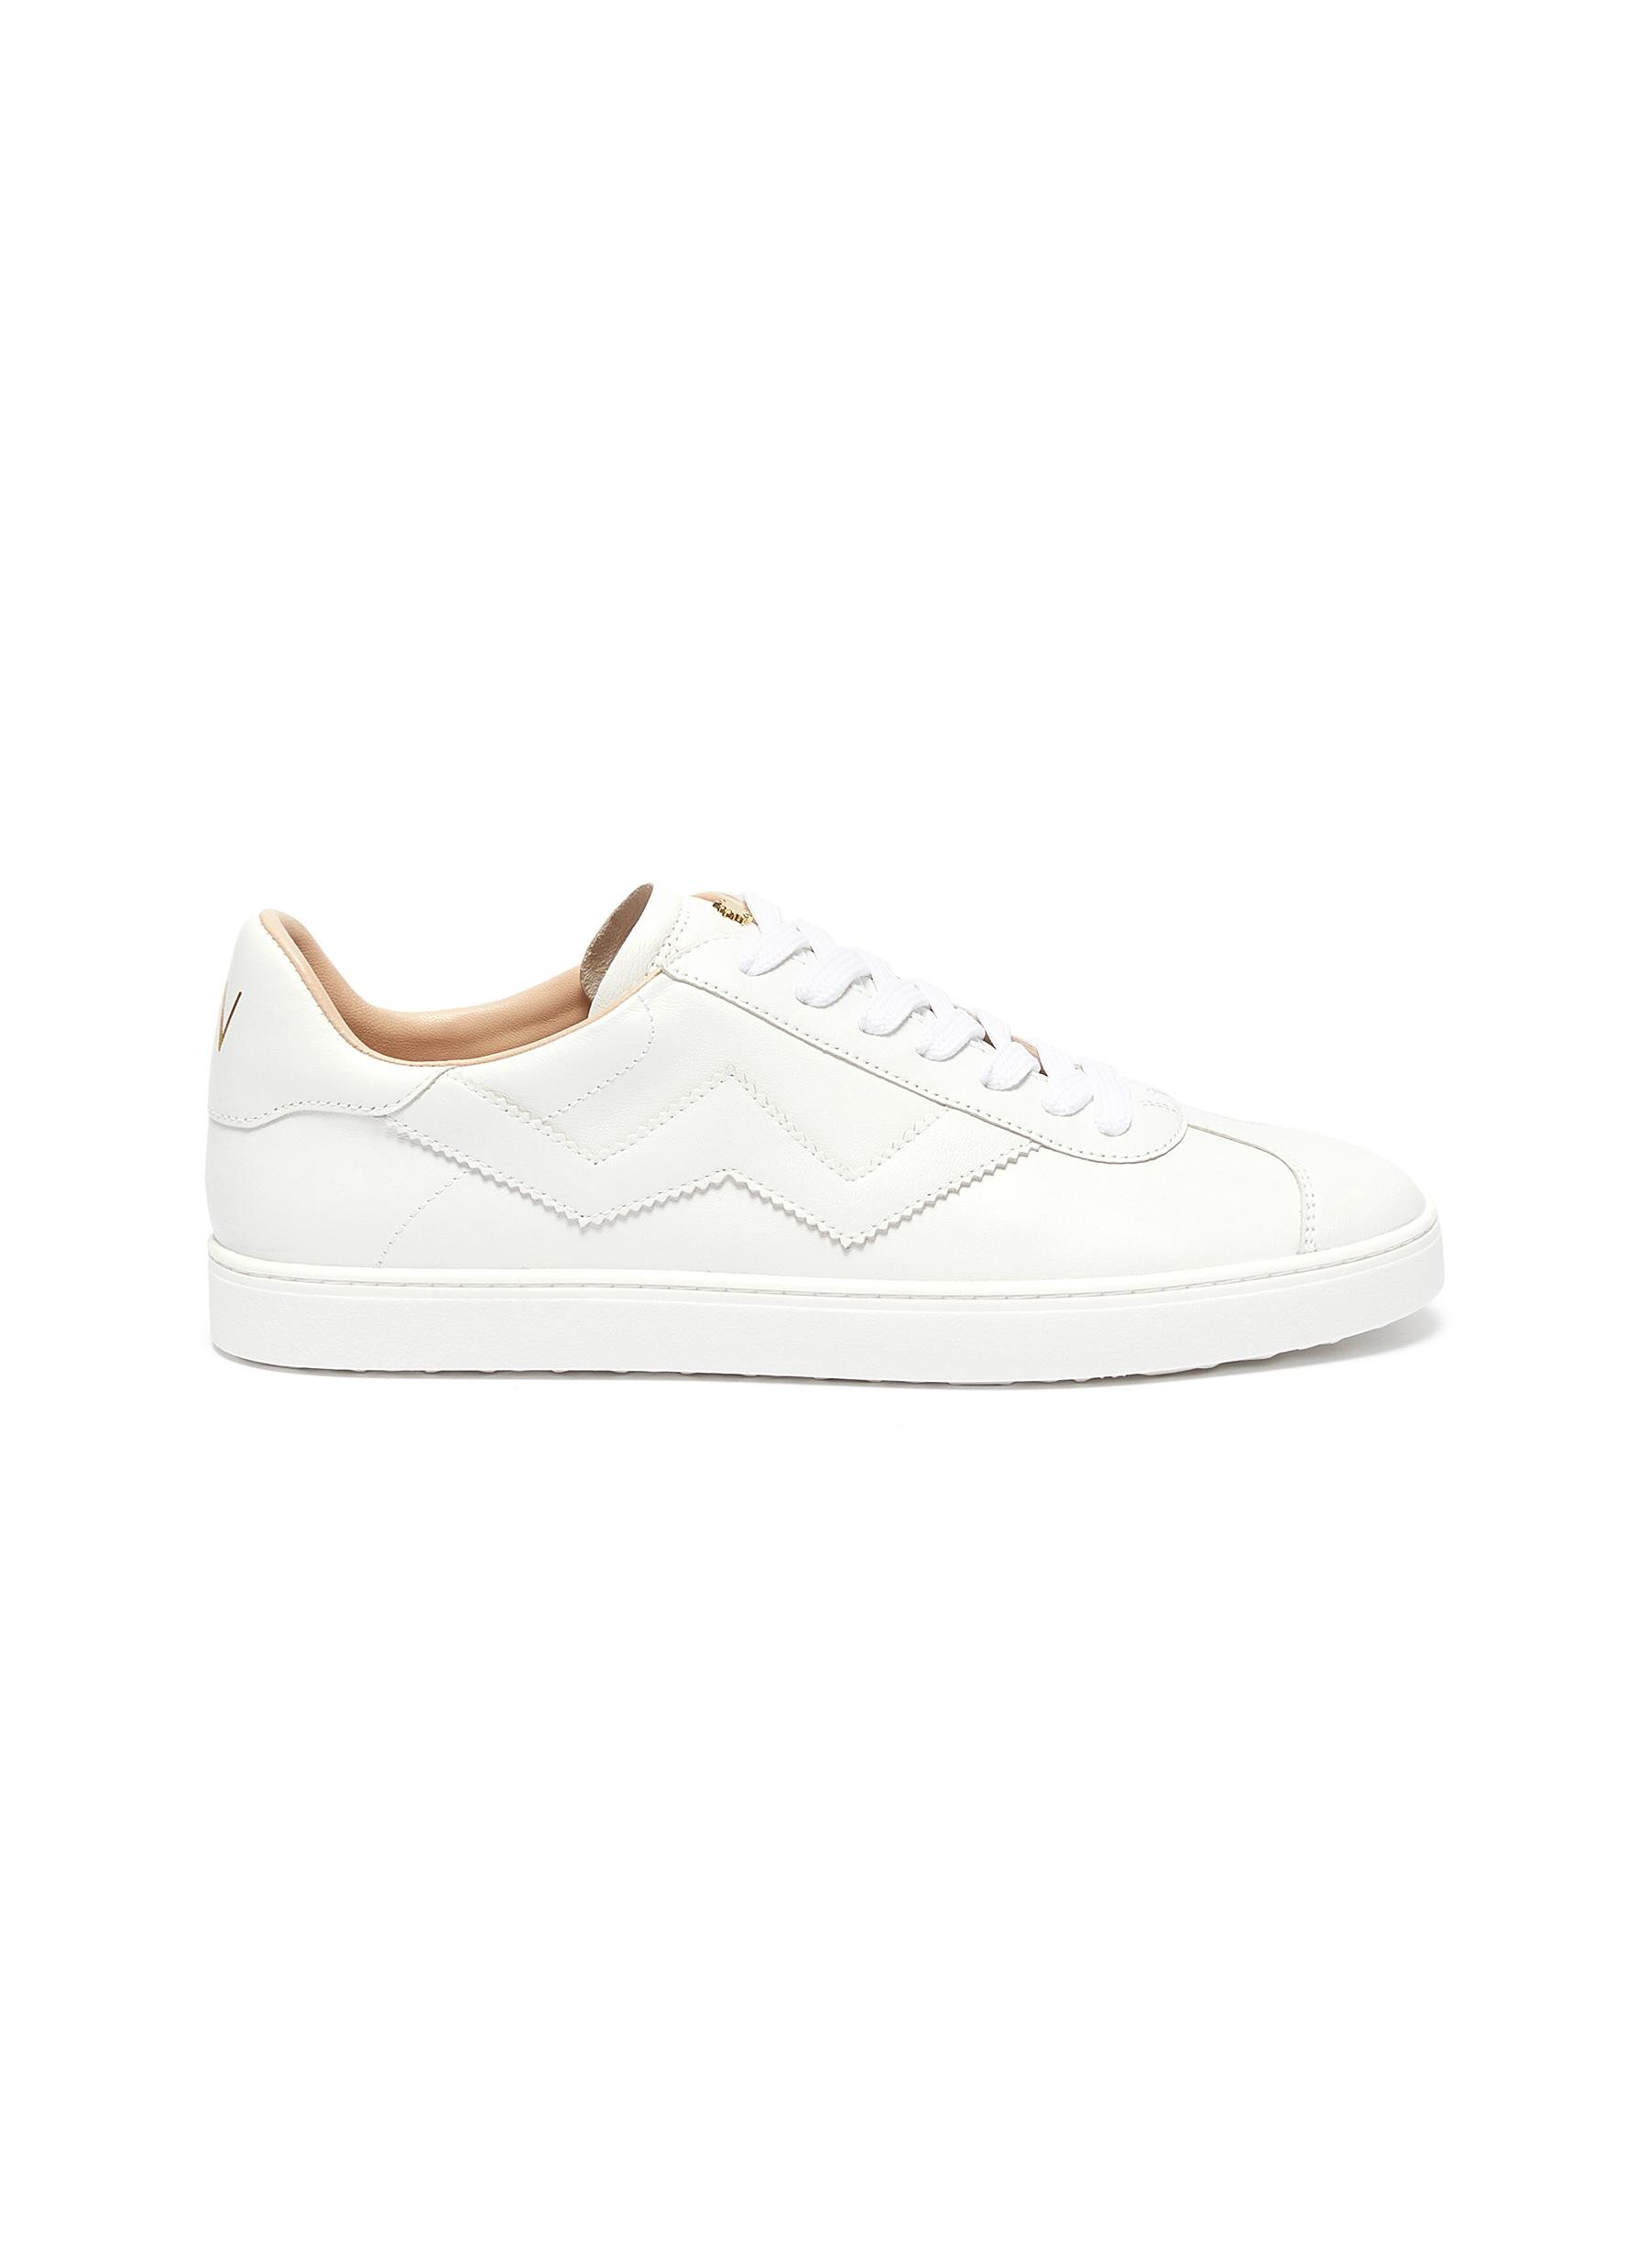 Stuart Weitzman Sneakers Daryl low top leather sneakers